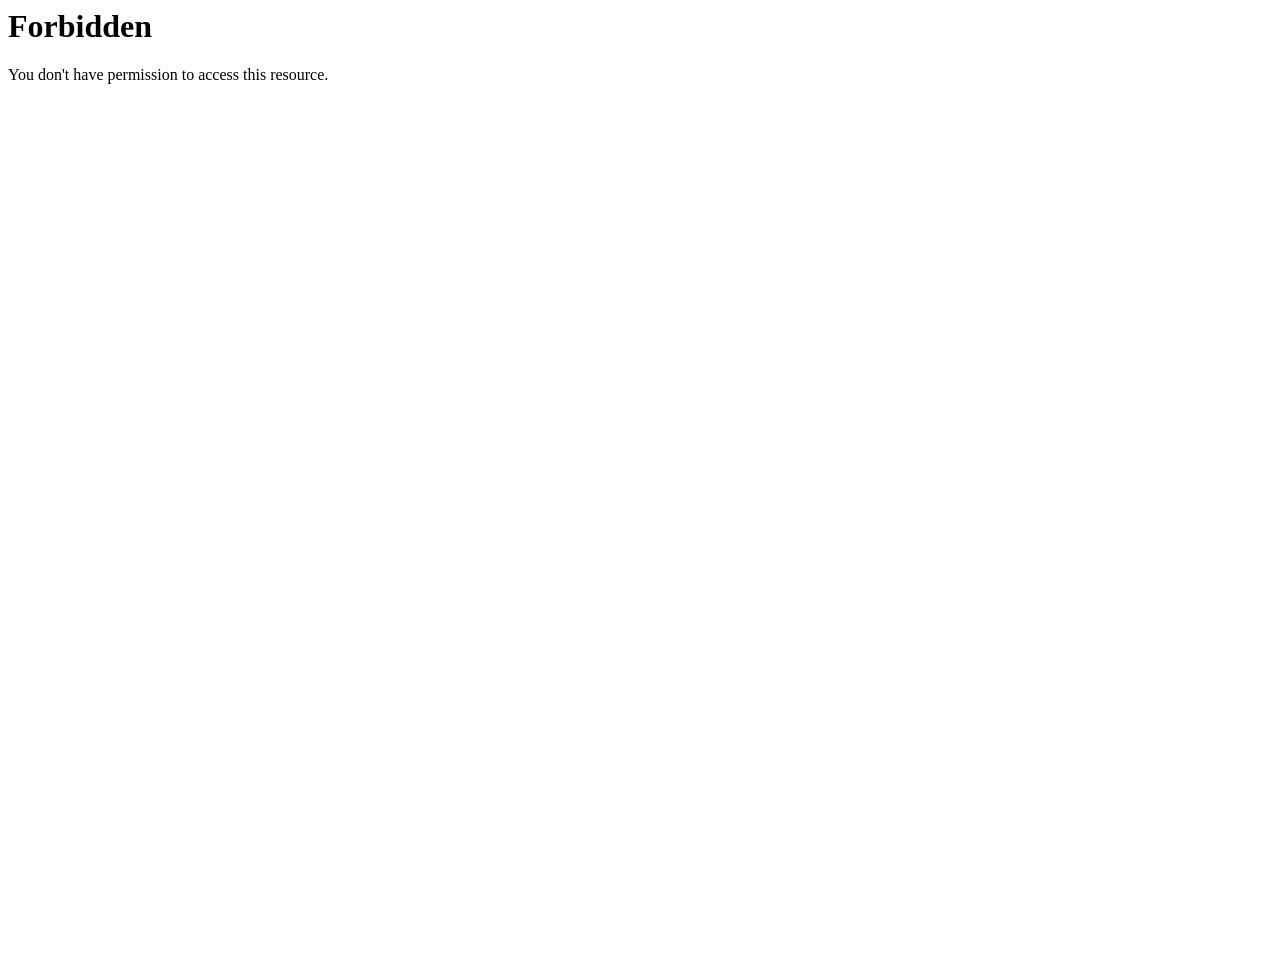 http://www.dts-s.com/rank.cgi?mode=link&id=2244&url=http%3a%2f%2fwww7a%2ebiglobe%2ene%2ejp%2f%257Enabena%2f